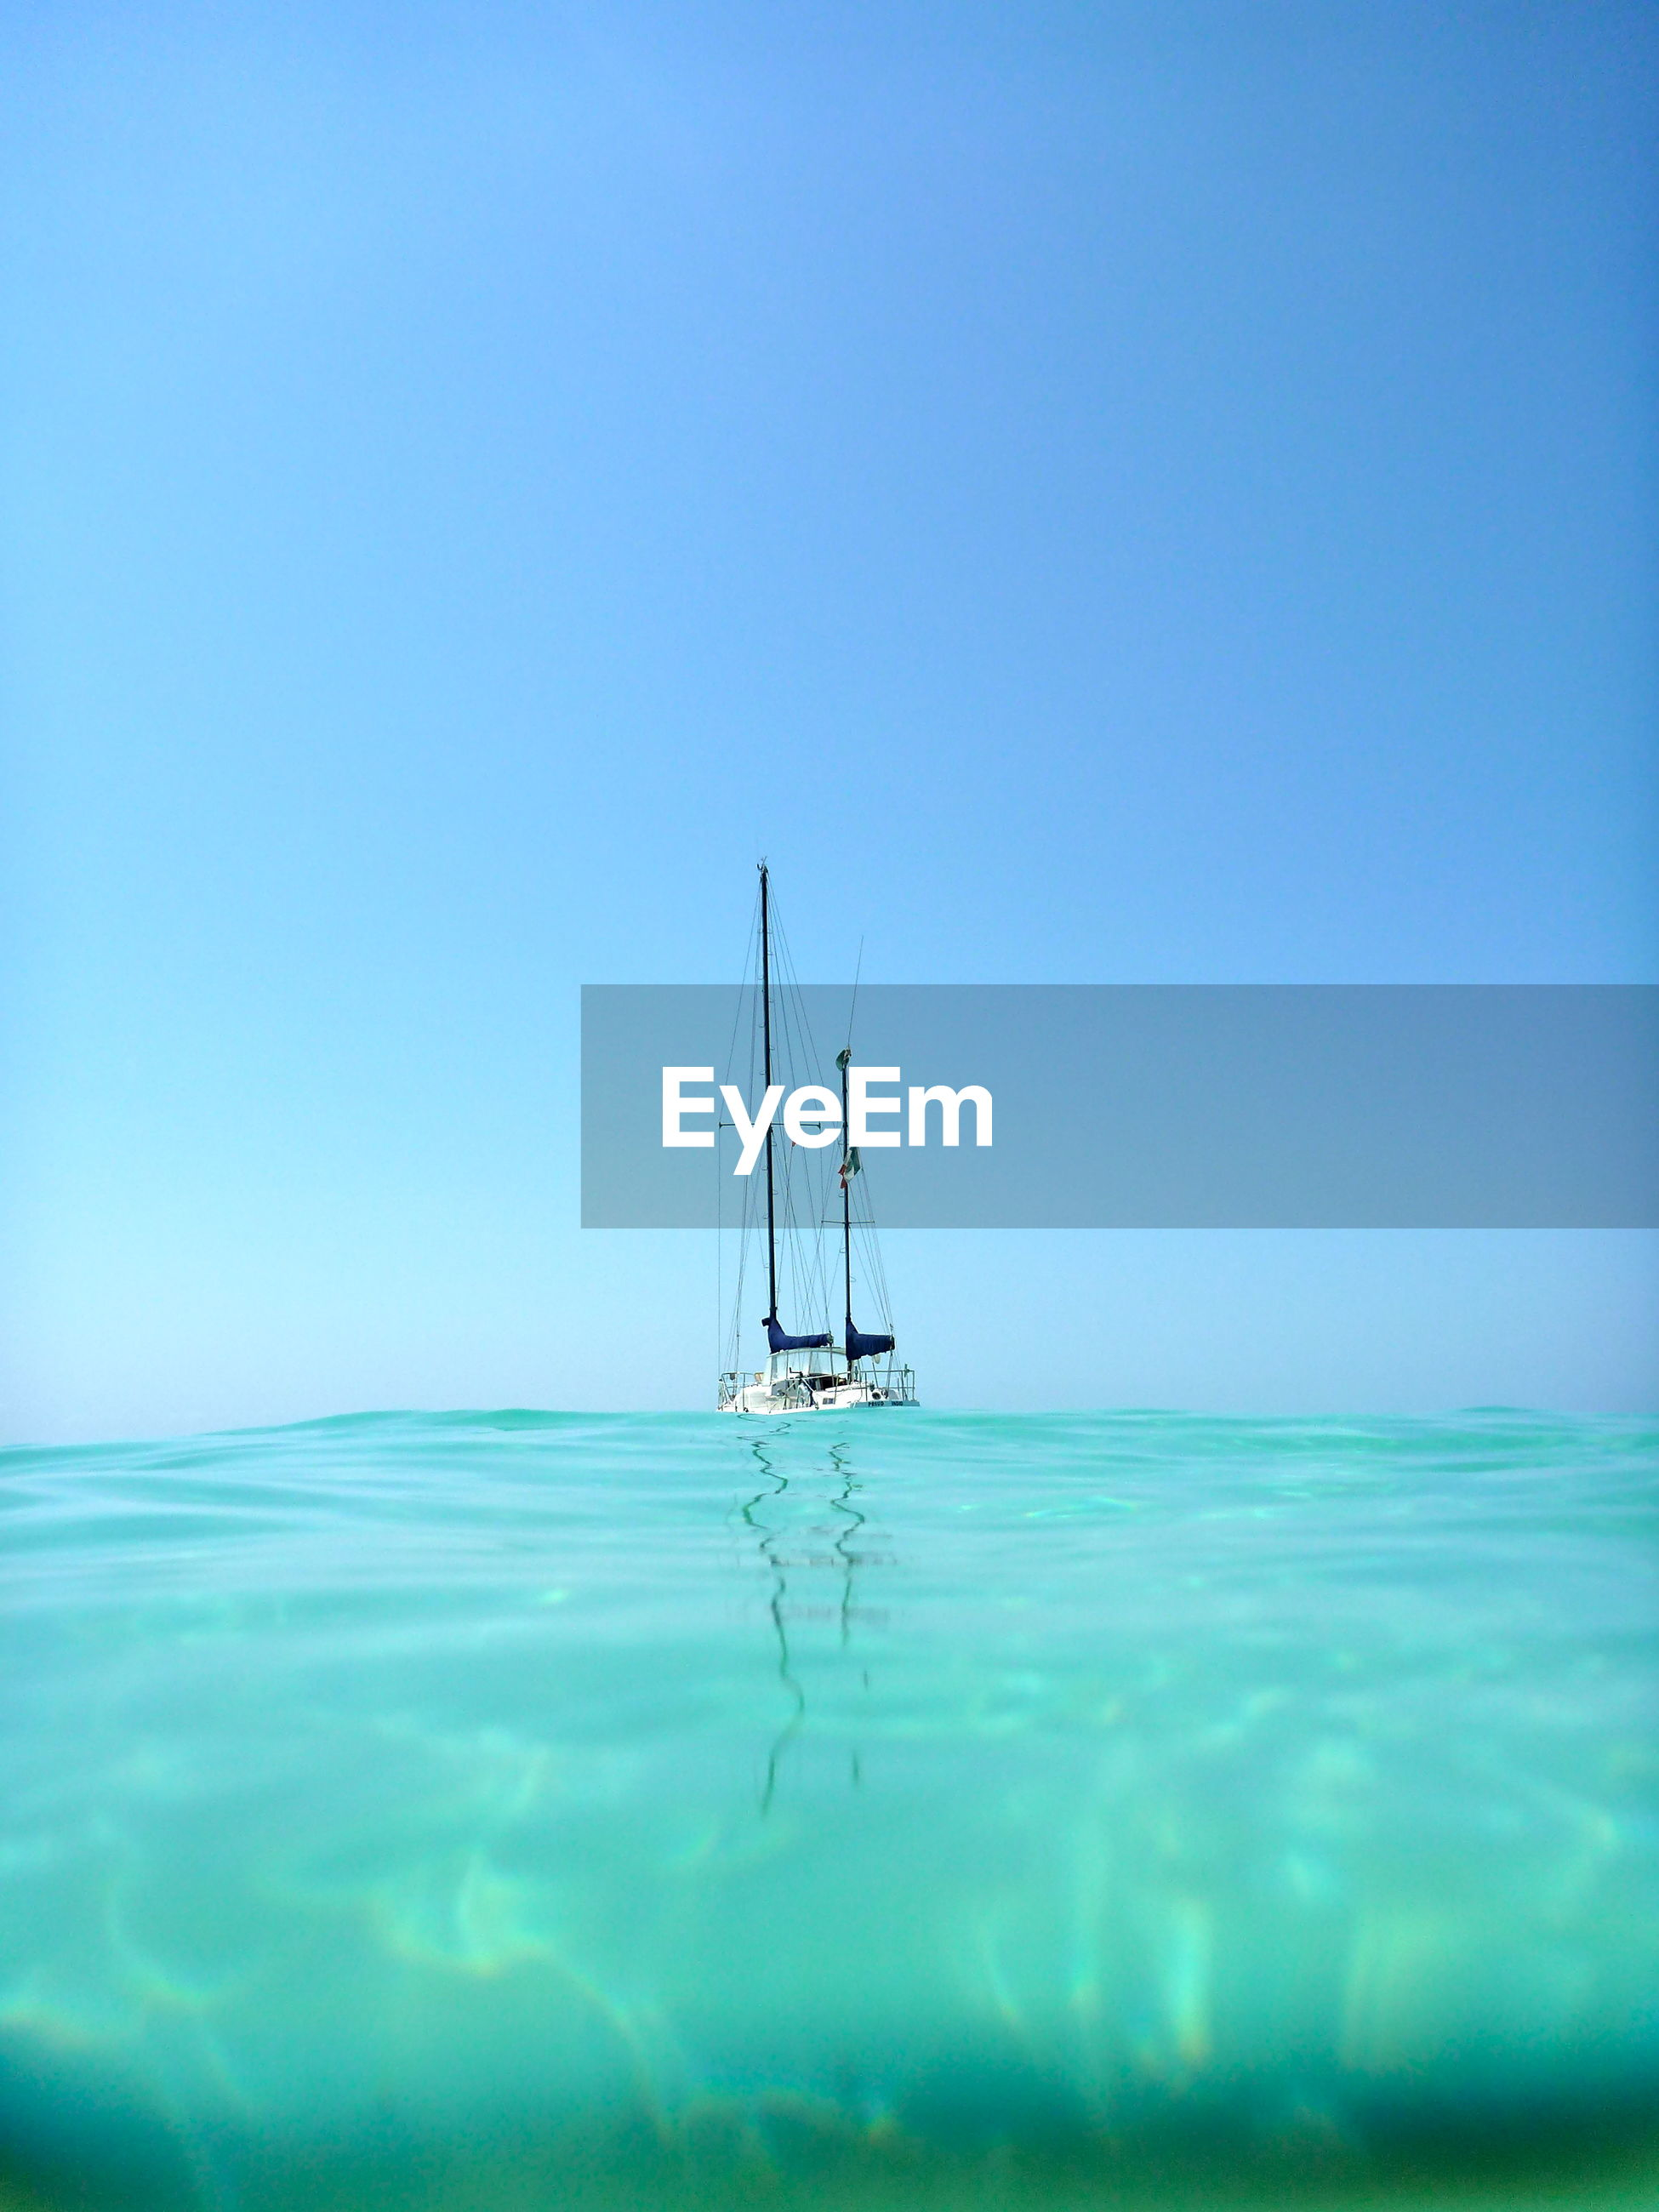 SAILBOAT IN SEA AGAINST BLUE SKY